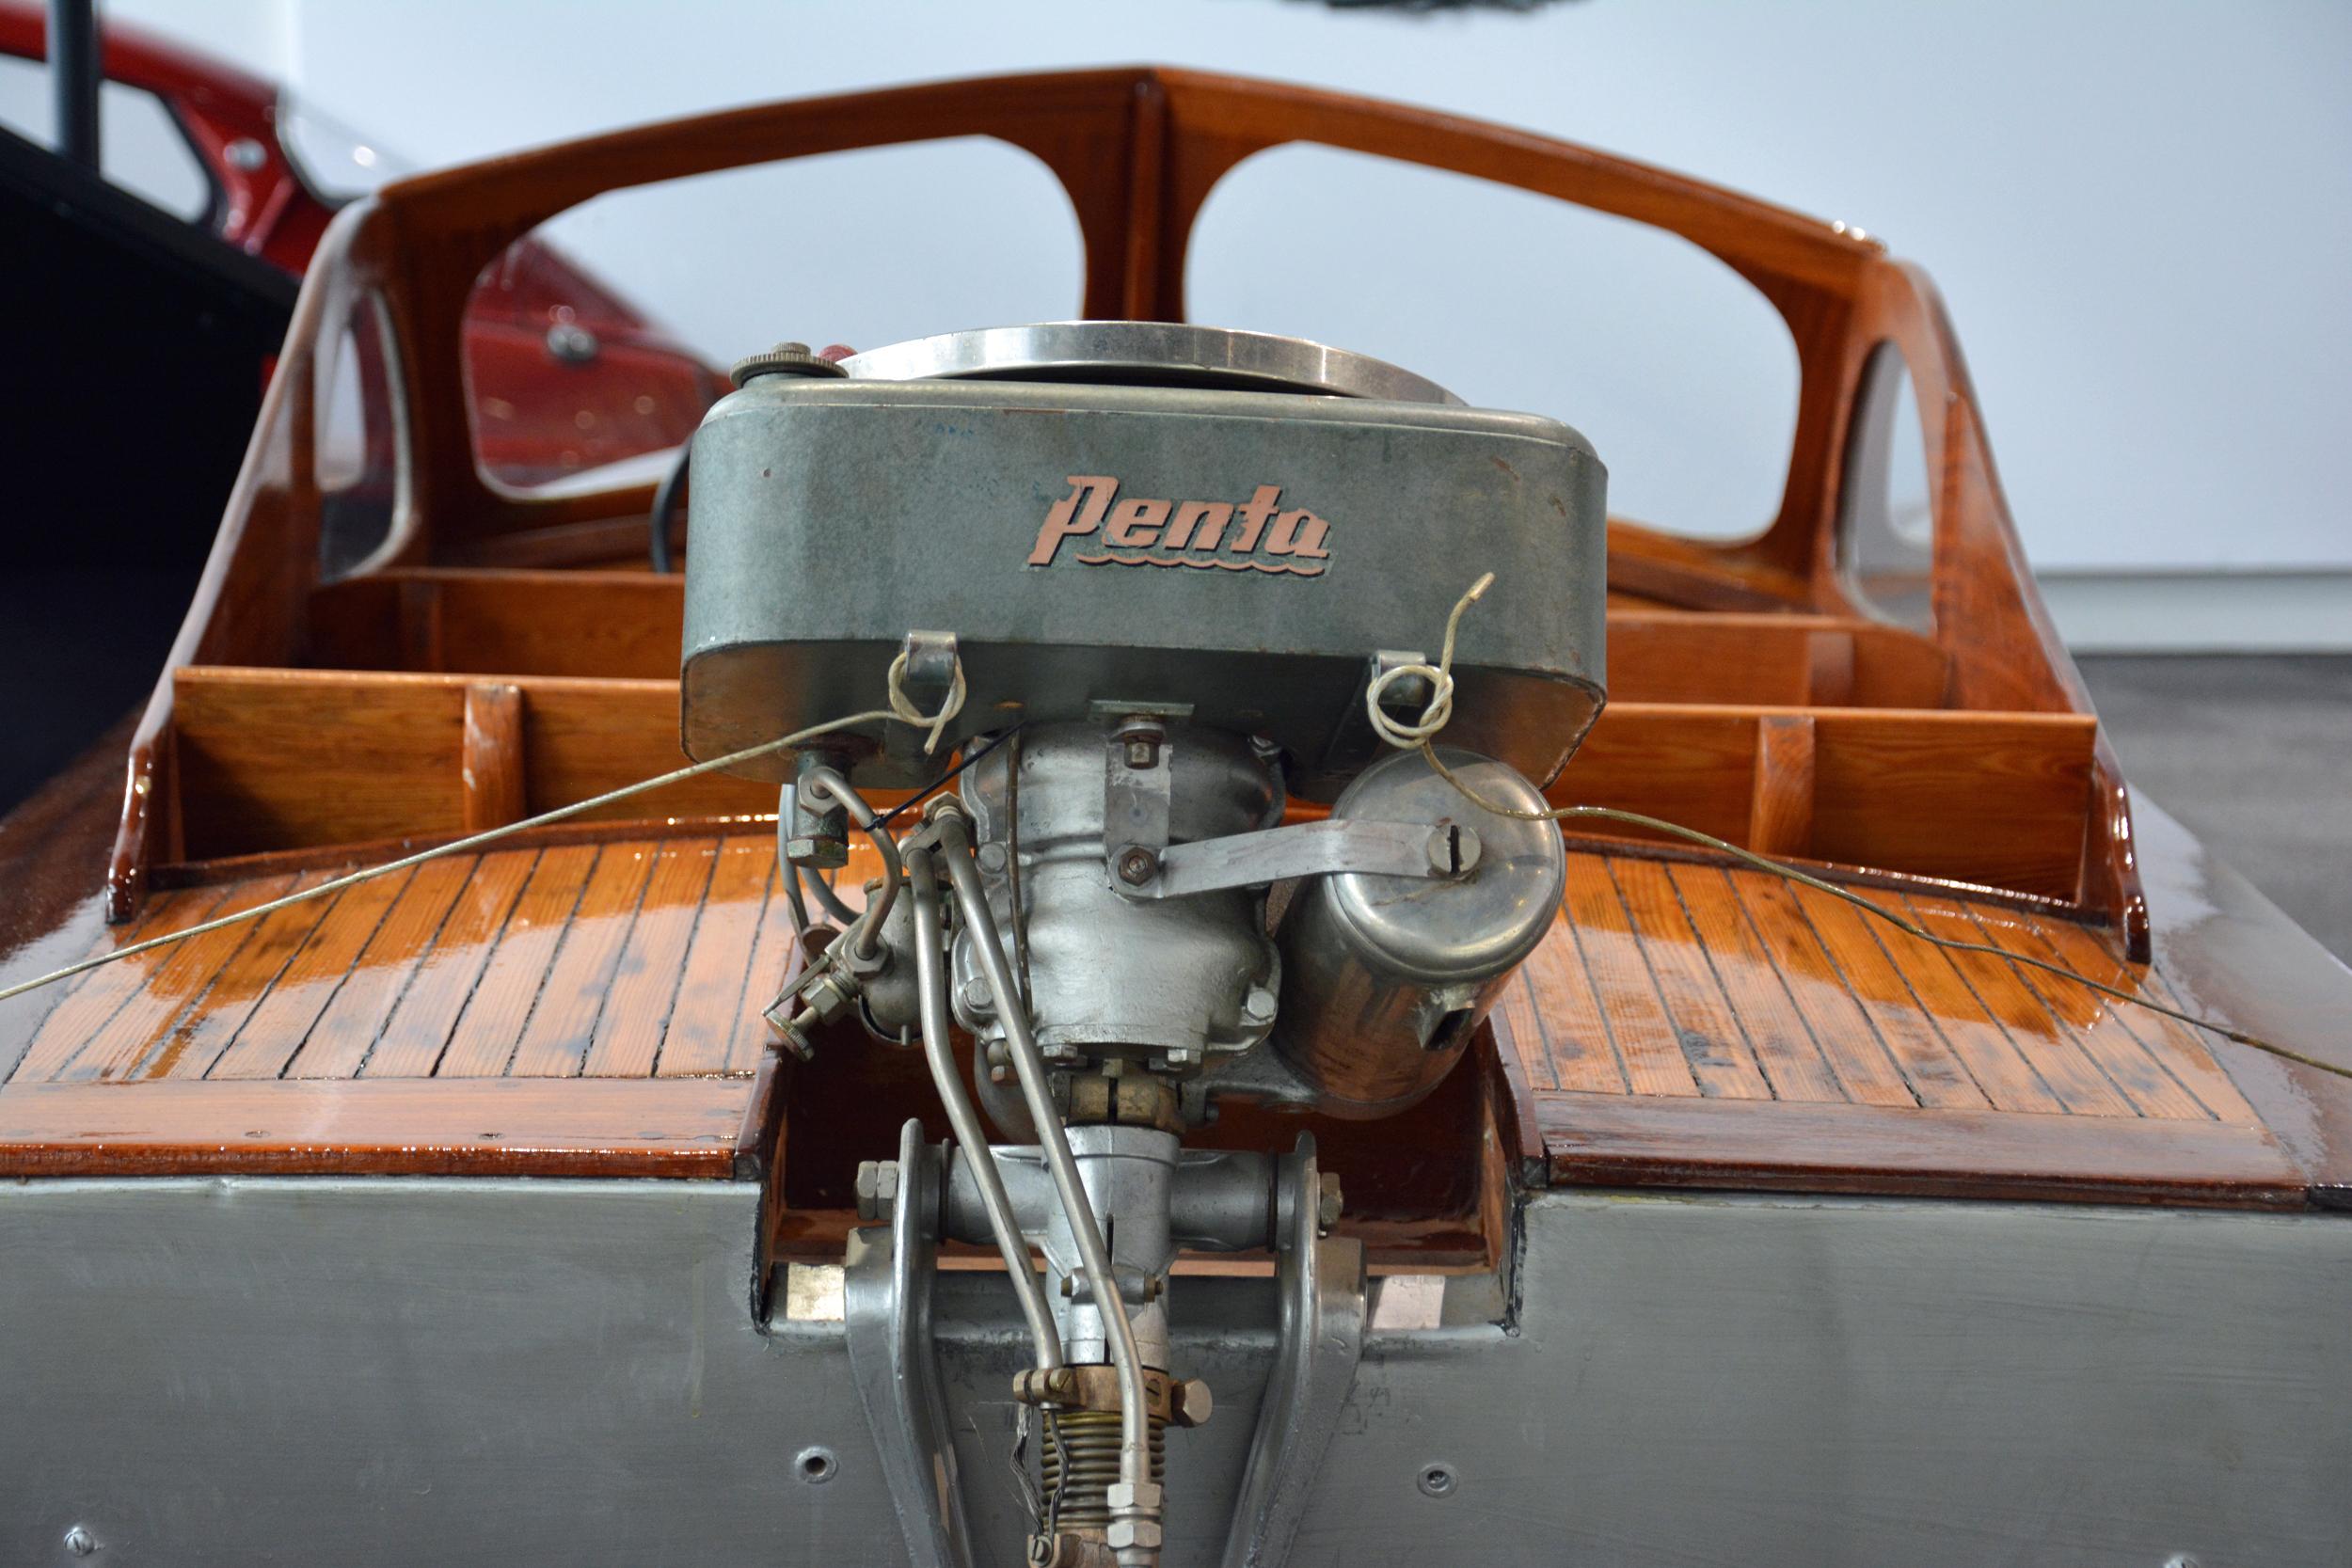 Saab Museum Penta engine rear view